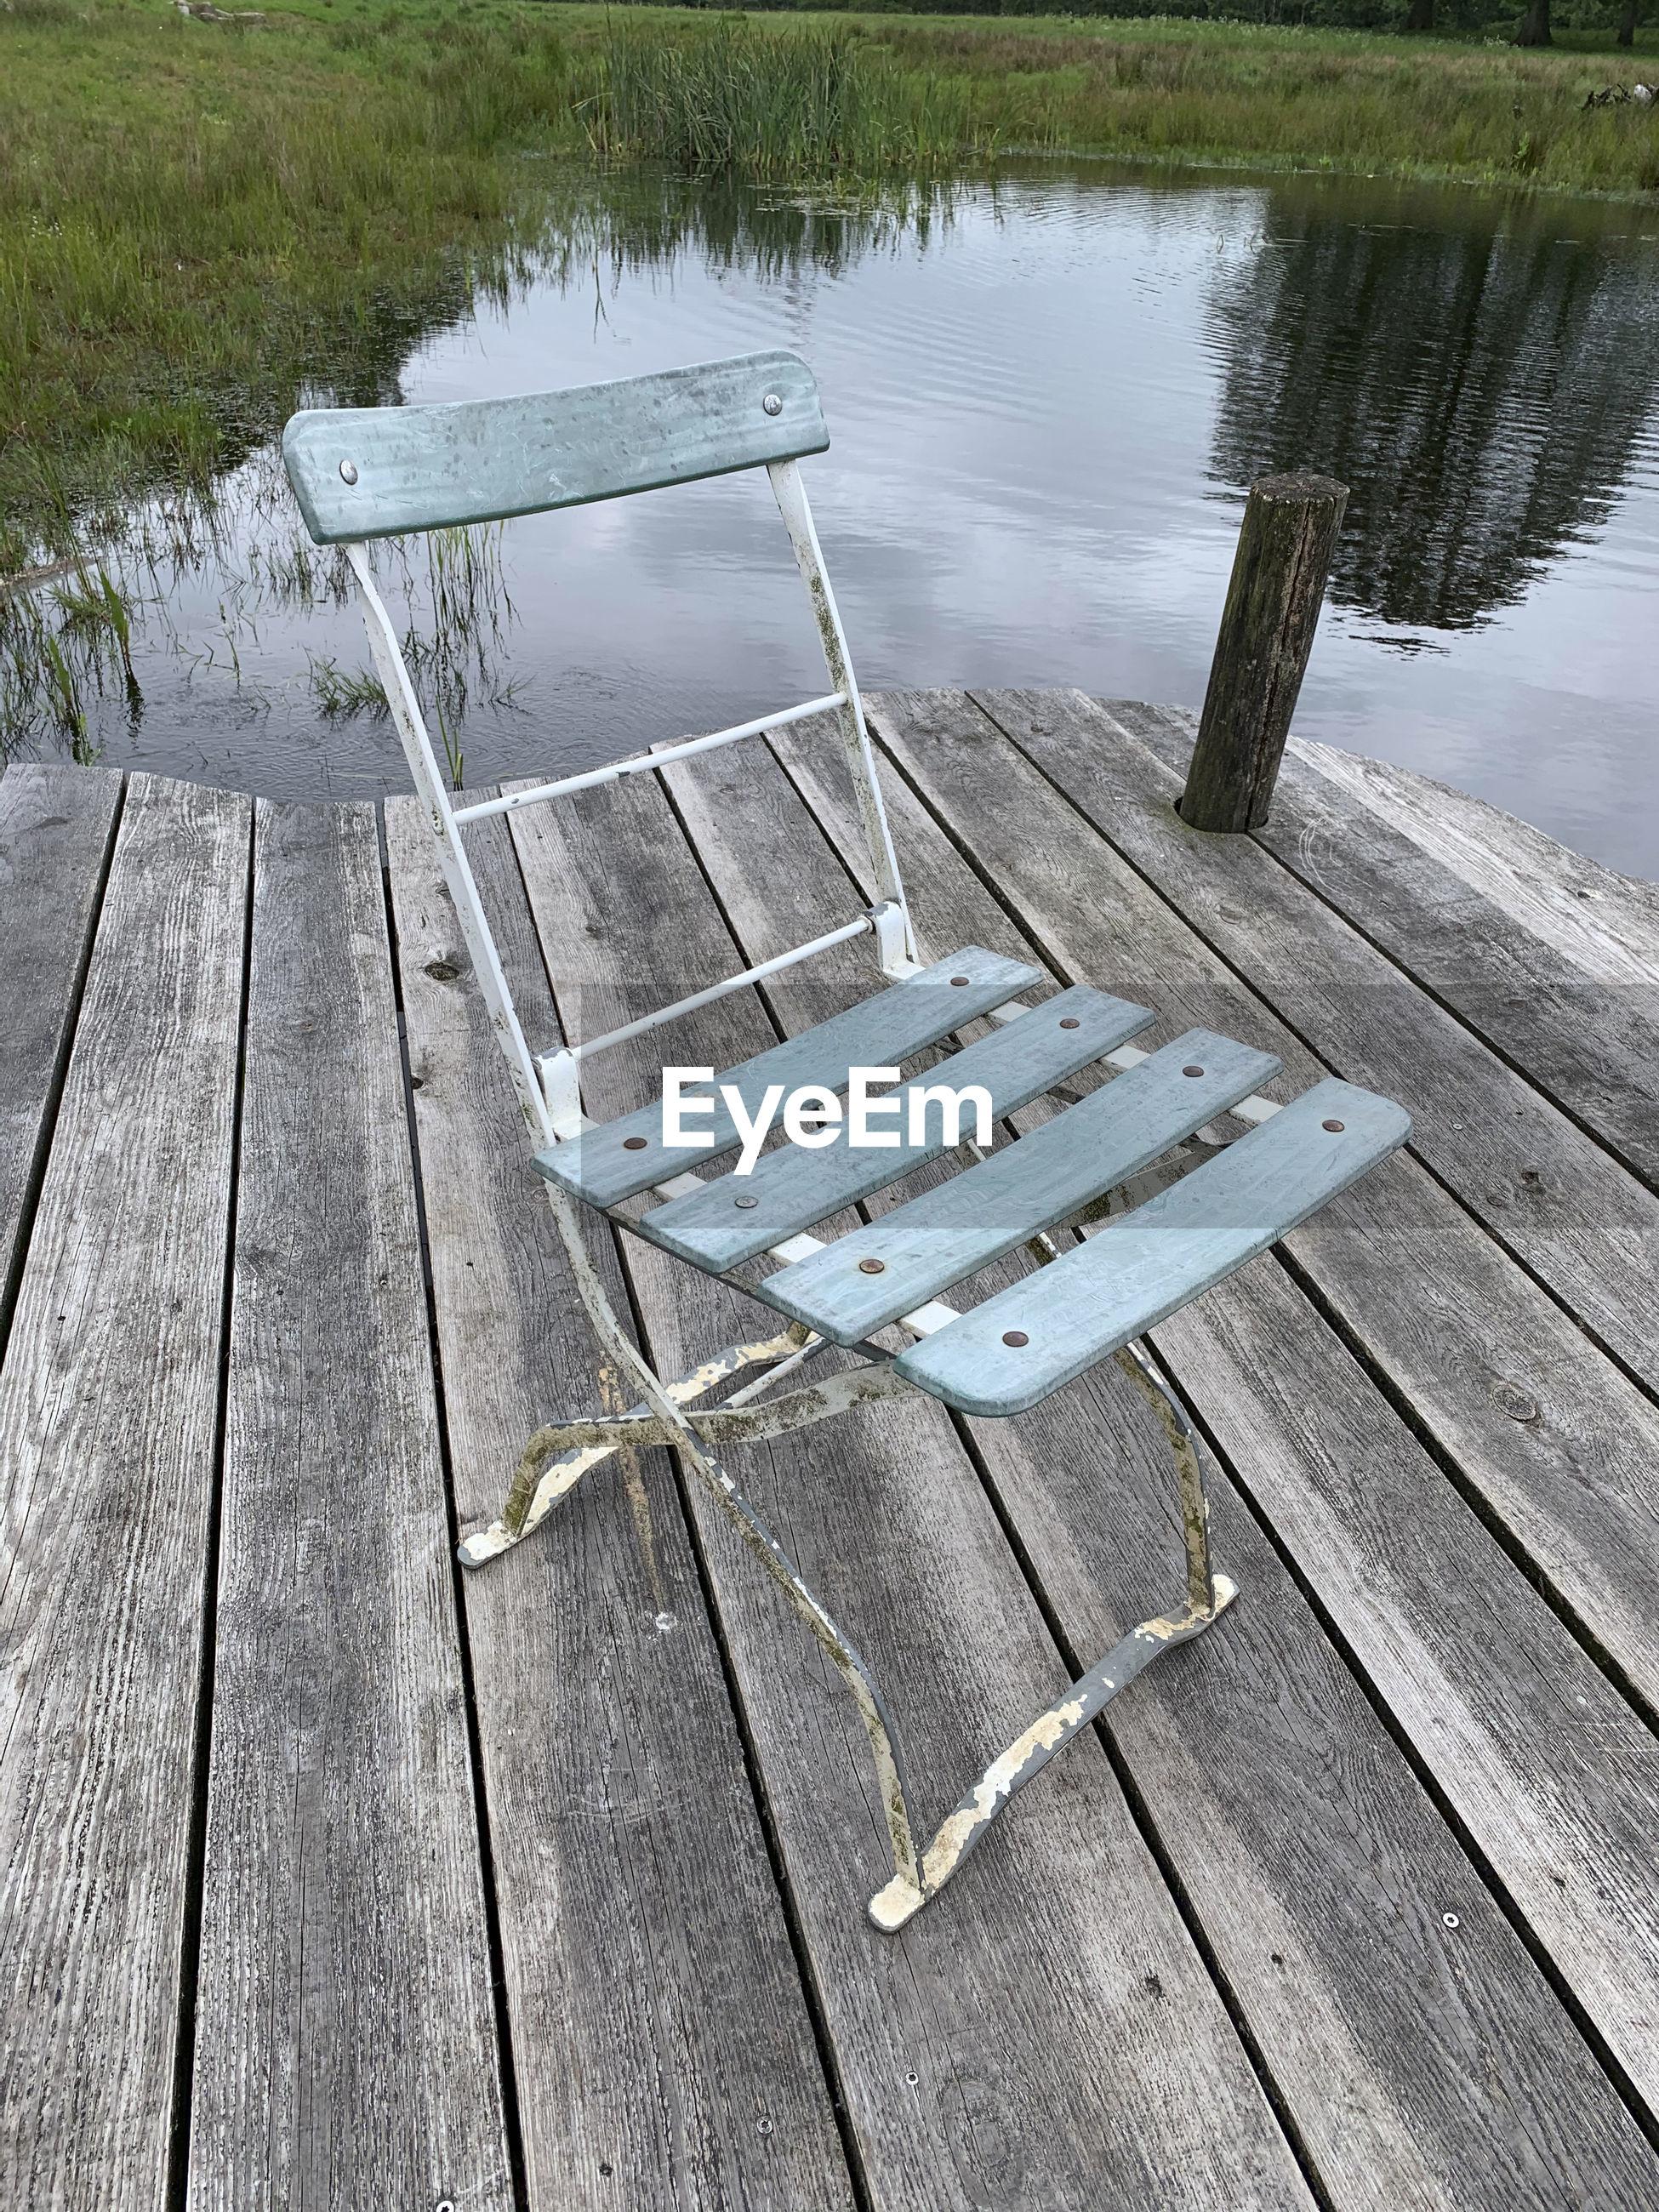 HIGH ANGLE VIEW OF PIER AND LAKE